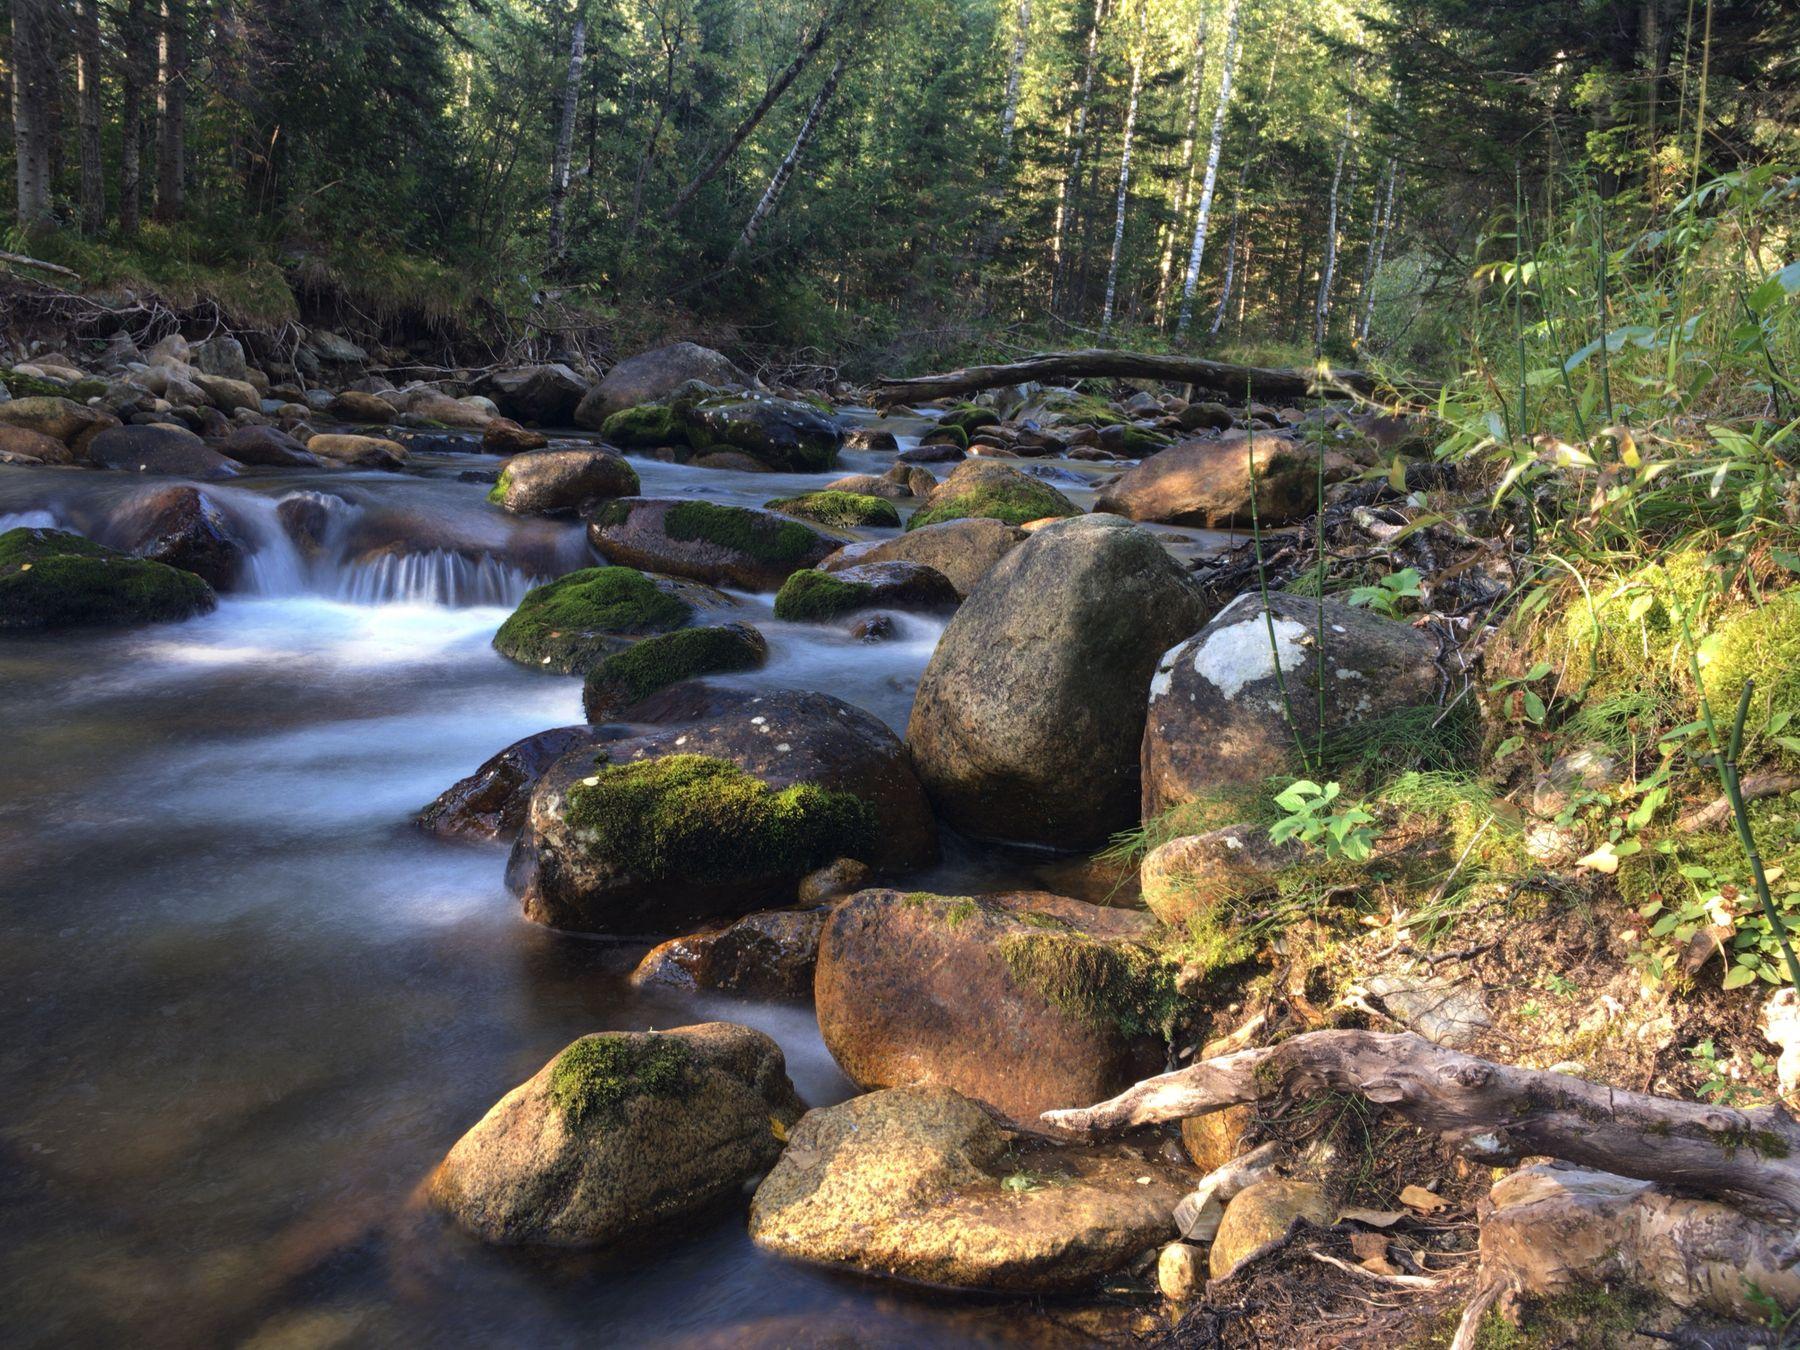 Таёжная речка Алтай осень река тайга